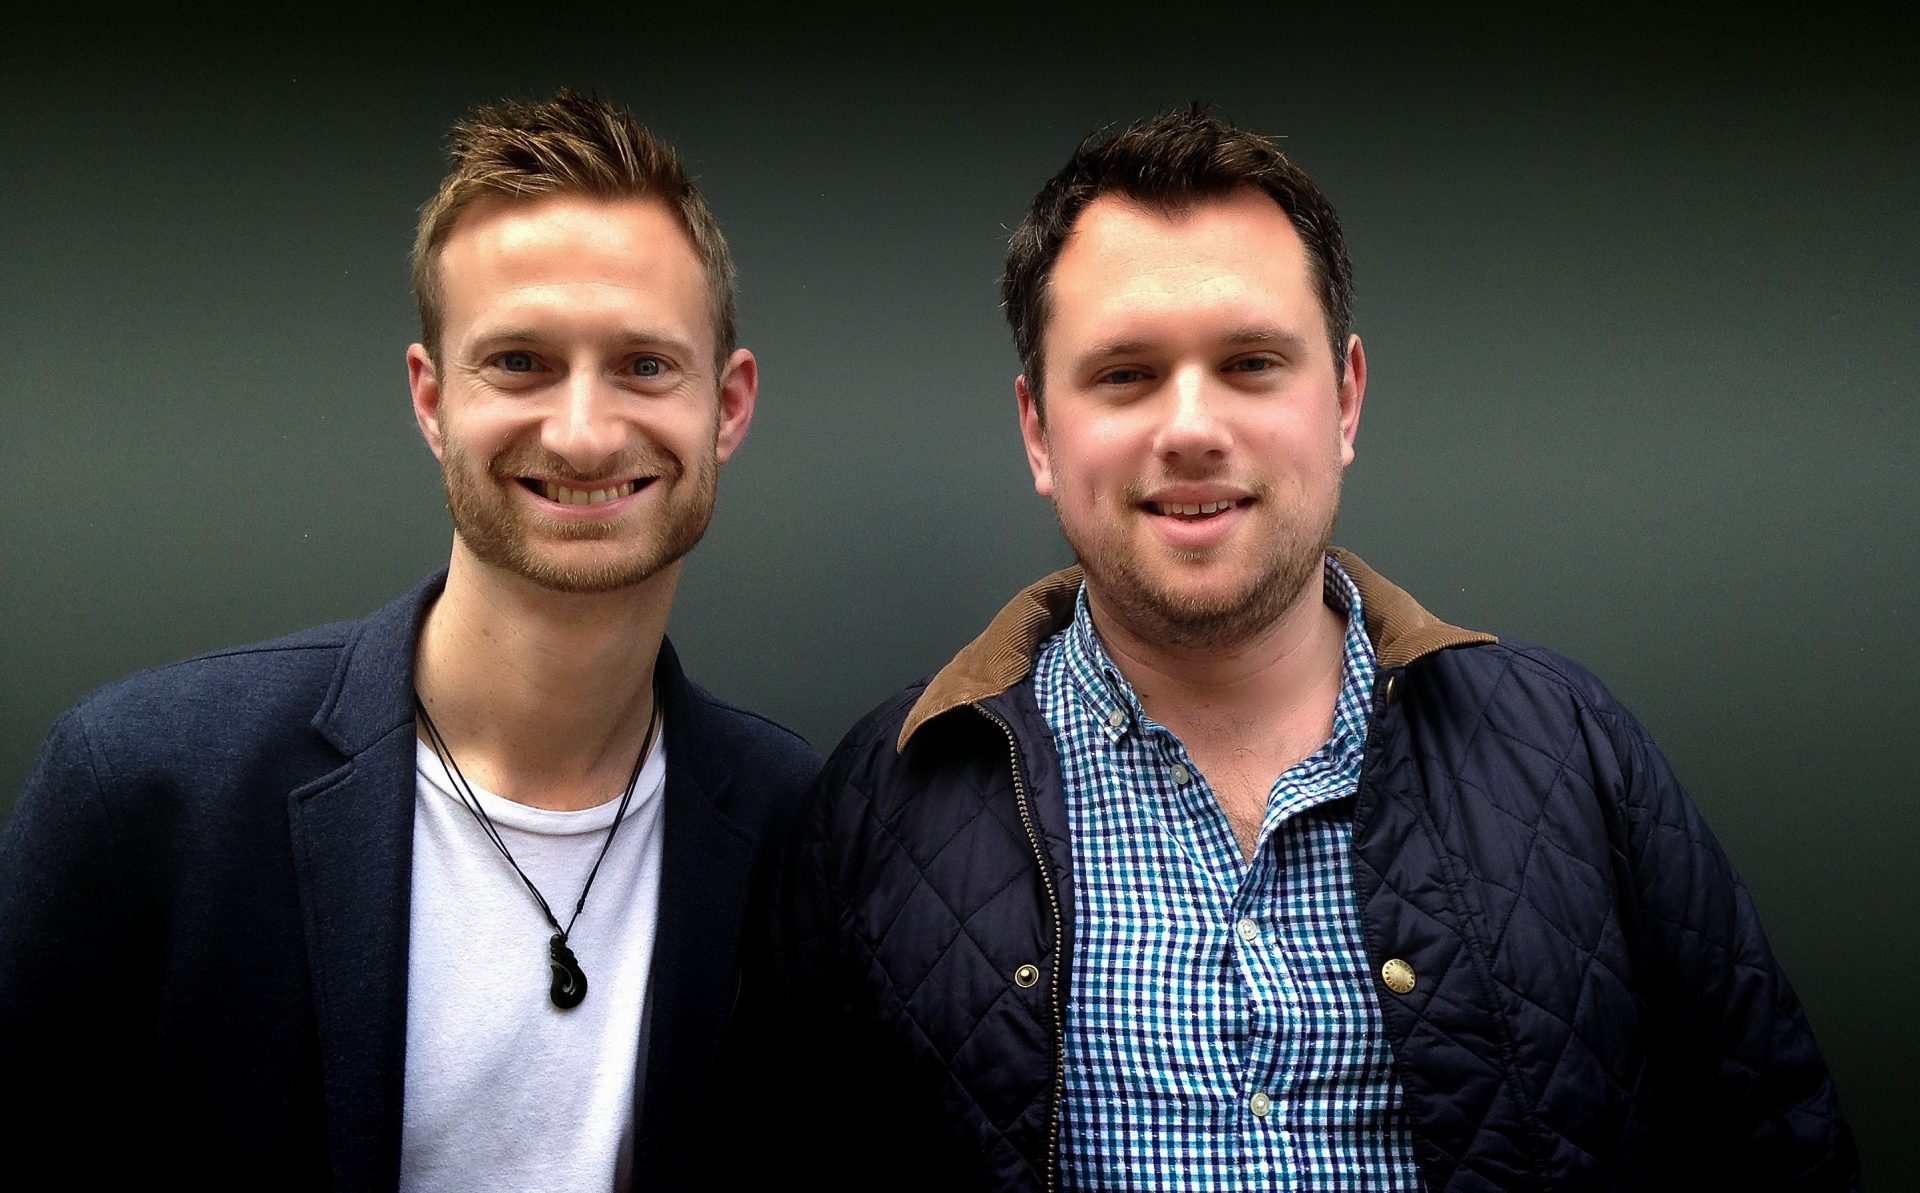 Tom Cross and Adam Burgess of Contraband Media